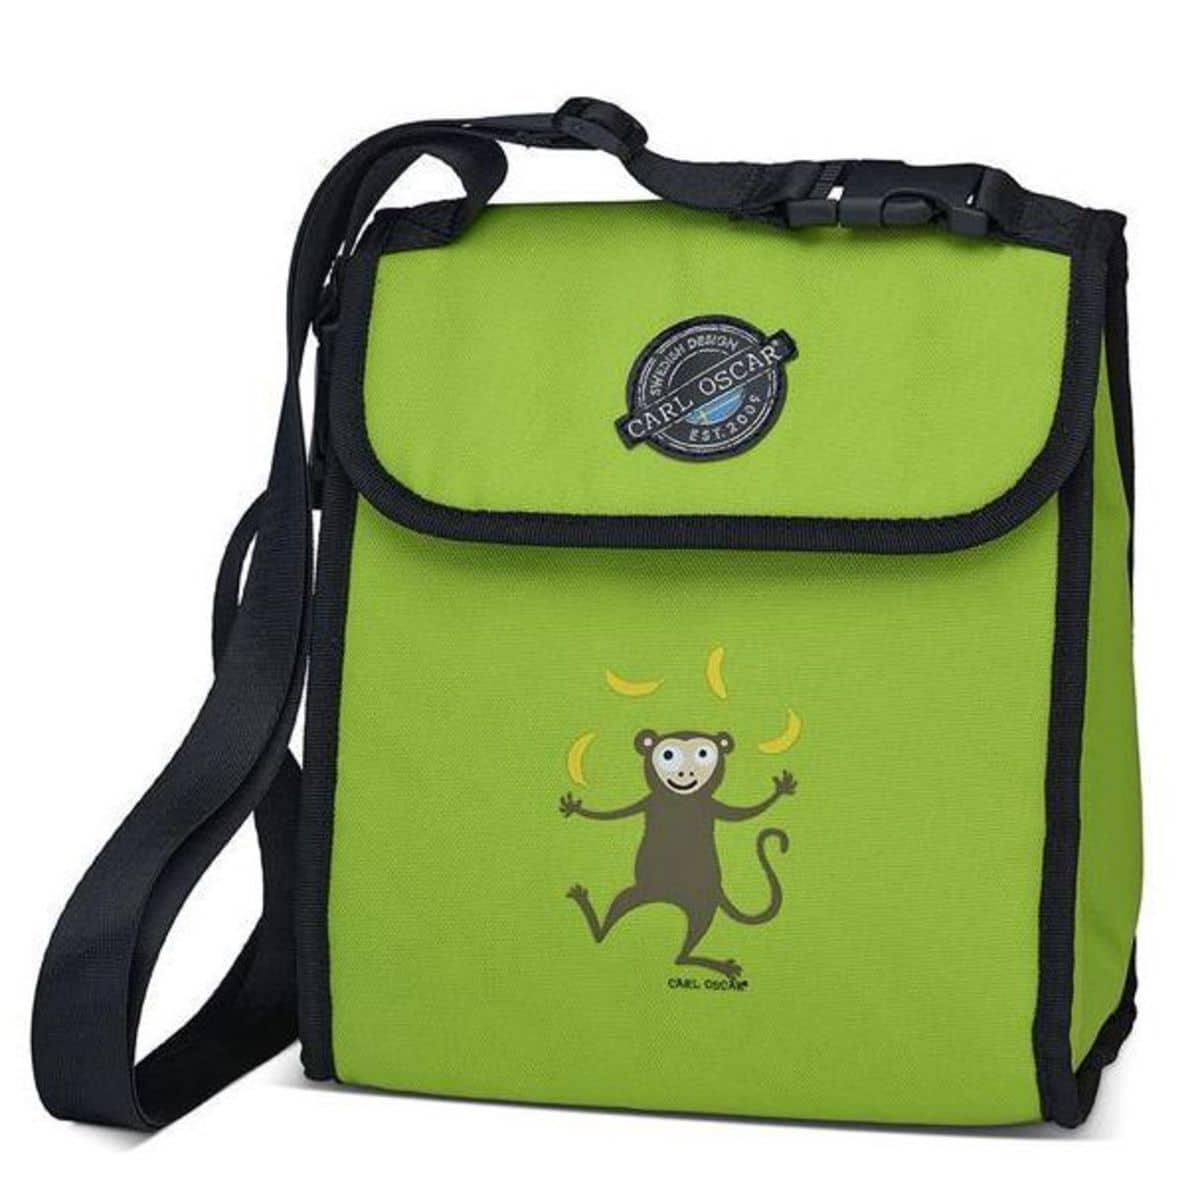 CARL OSCAR Pack n' Snack™ CoolerBag Lime Monkey